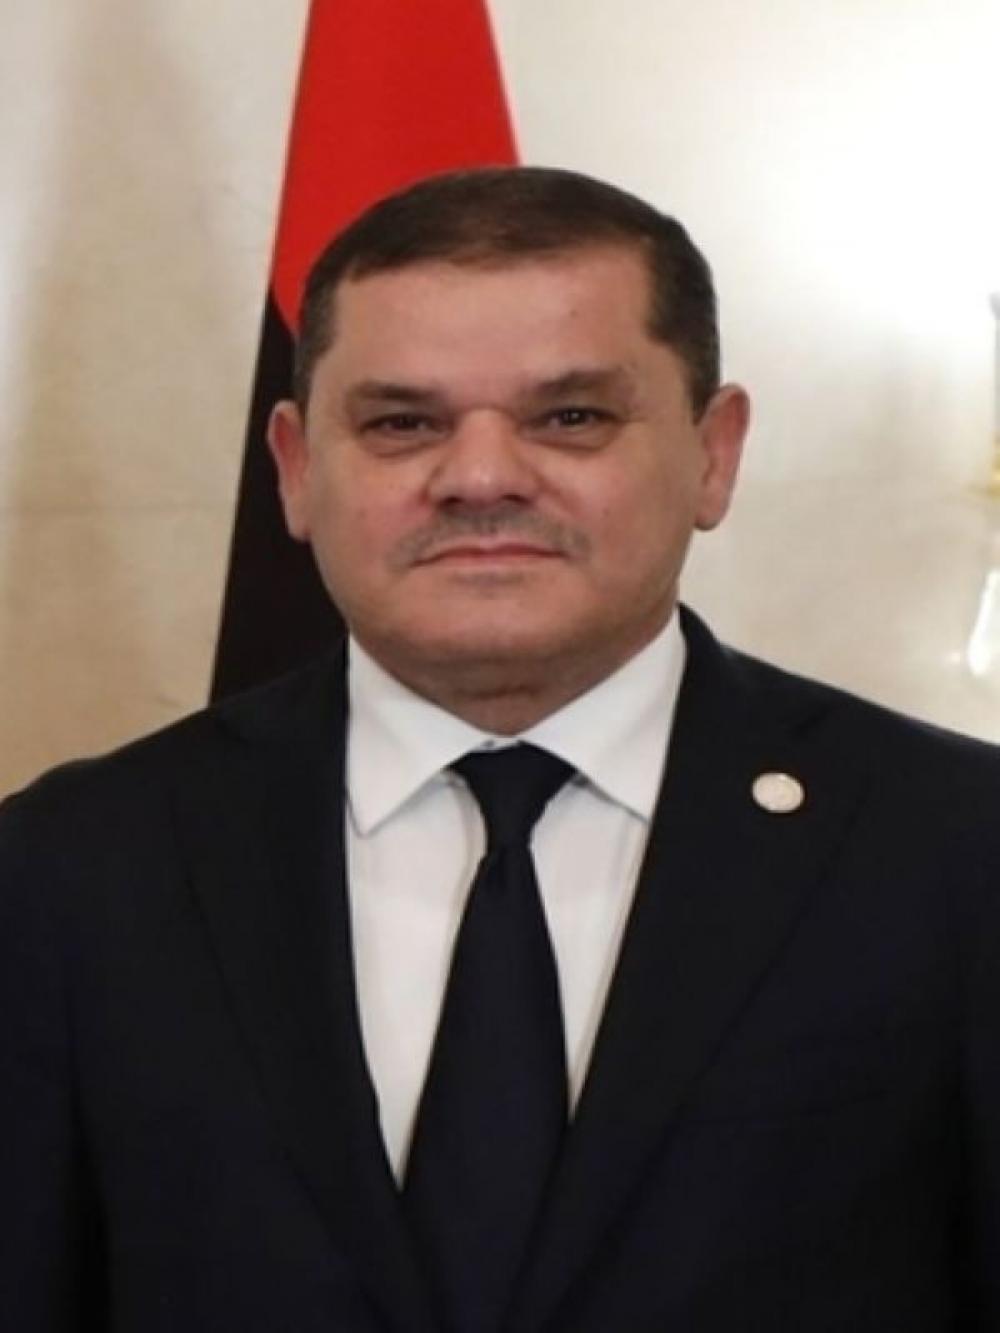 Ahead of peace talks, Libya PM says critical coastal road reopened